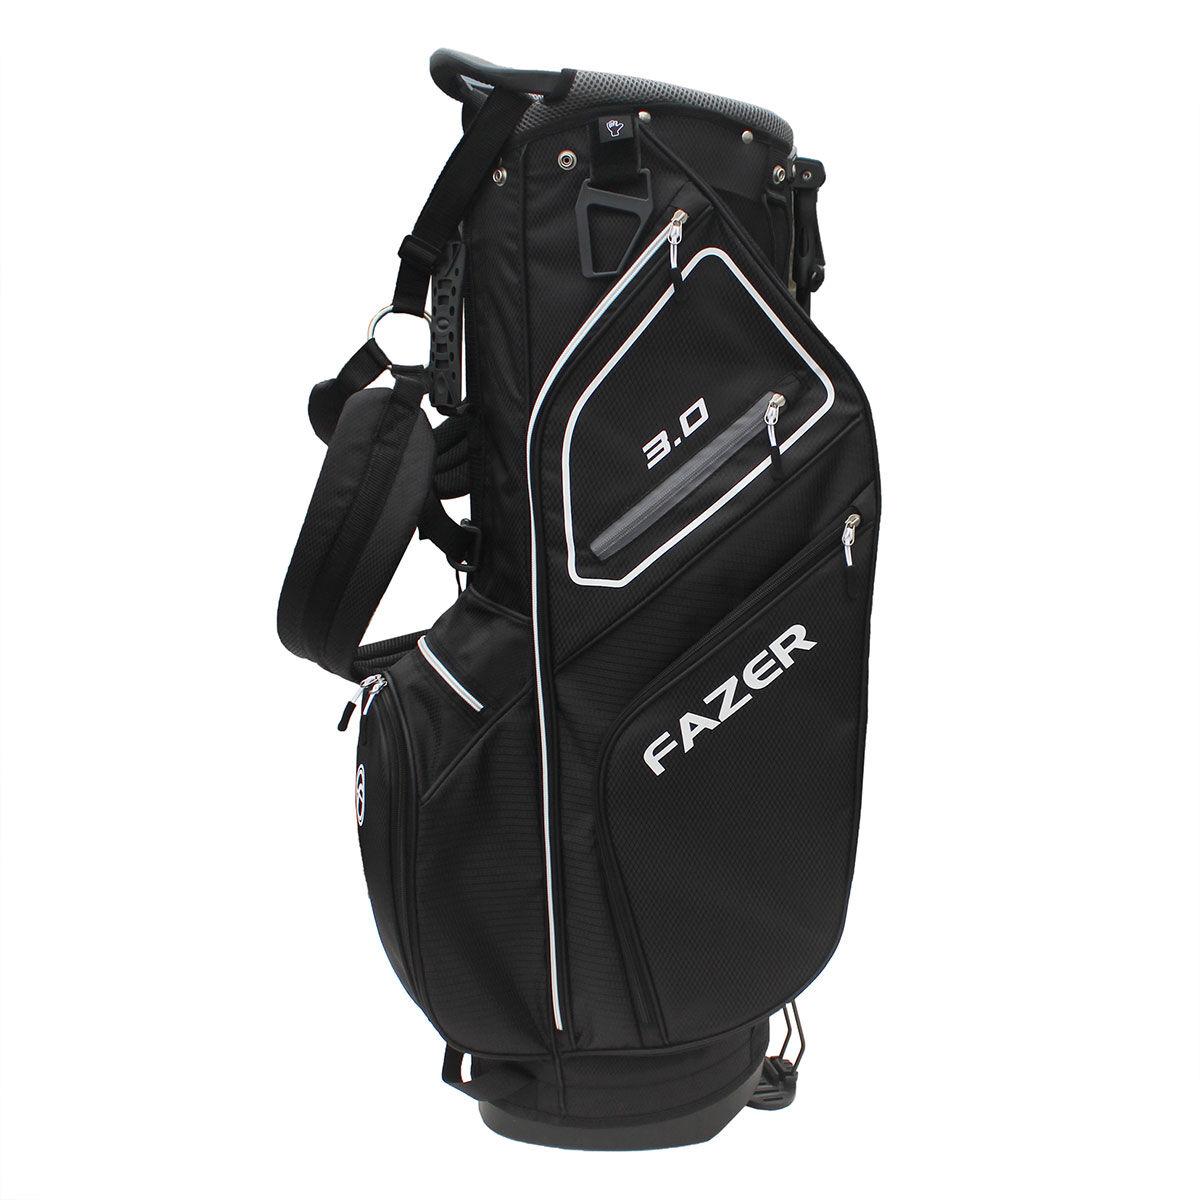 Fazer 3.0 Golf Stand Bag, Black/silver, One Size | American Golf